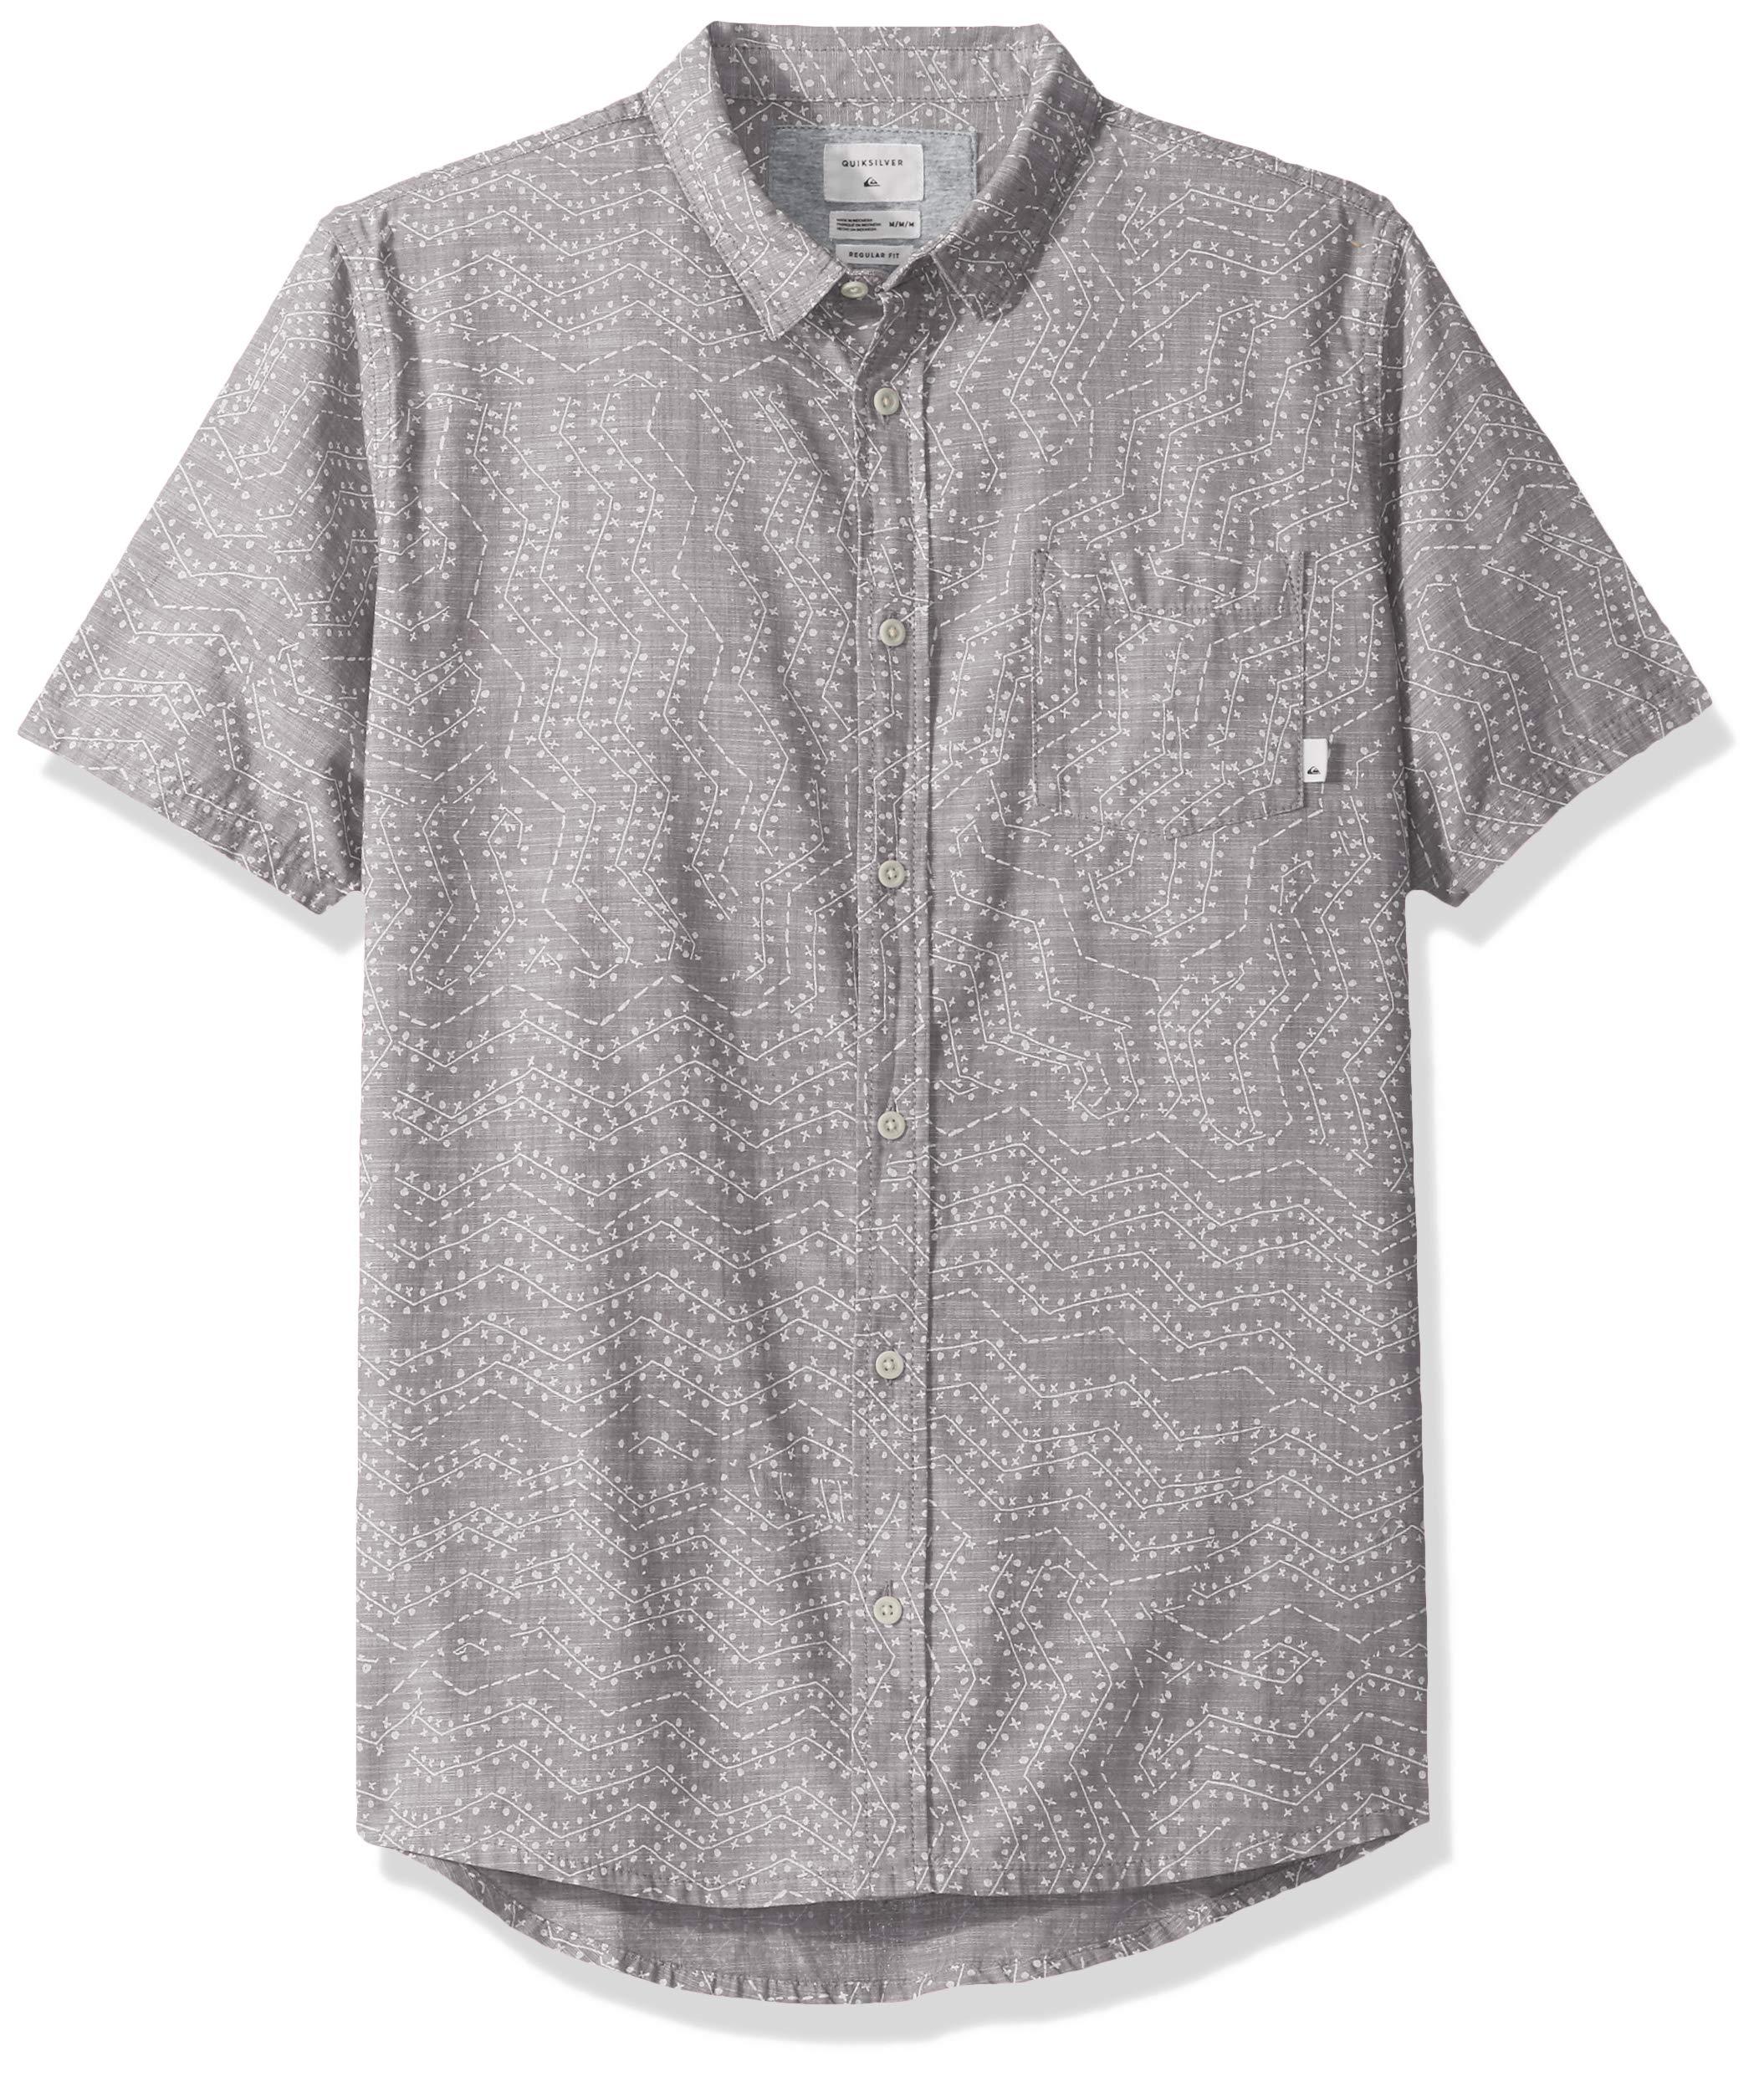 Quiksilver Men's Golden Wattle Short Sleeve Woven